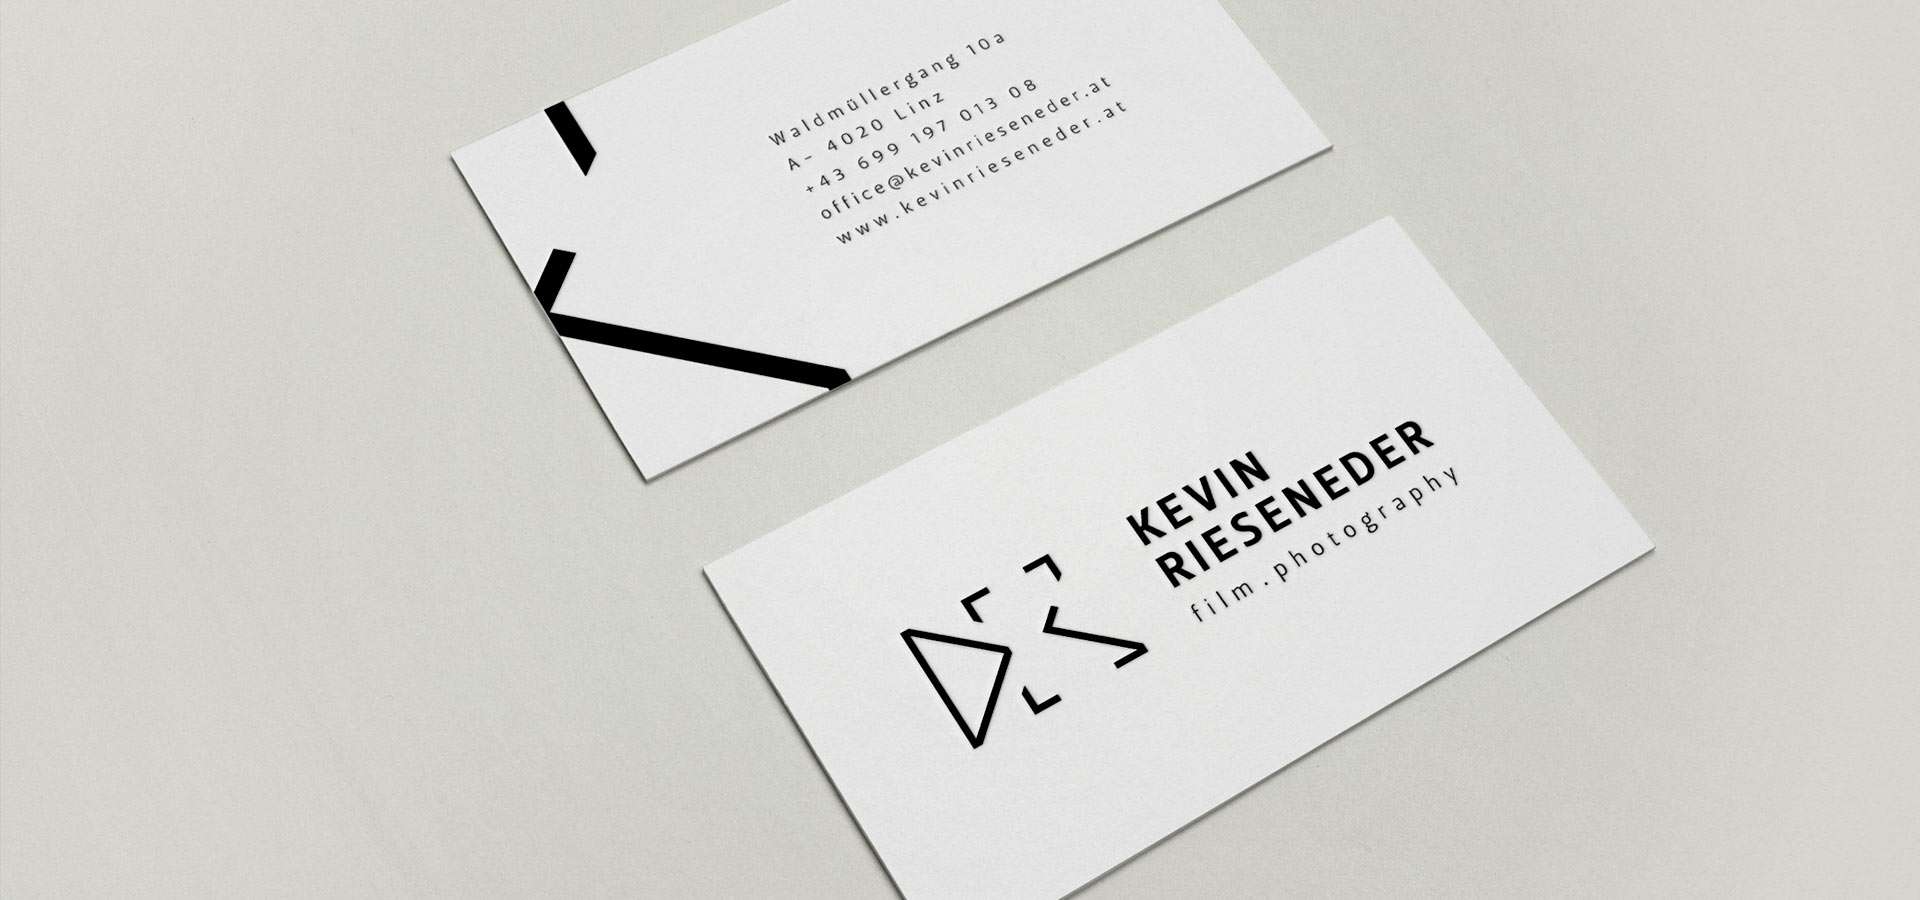 kevin_businesscards_top1.jpg